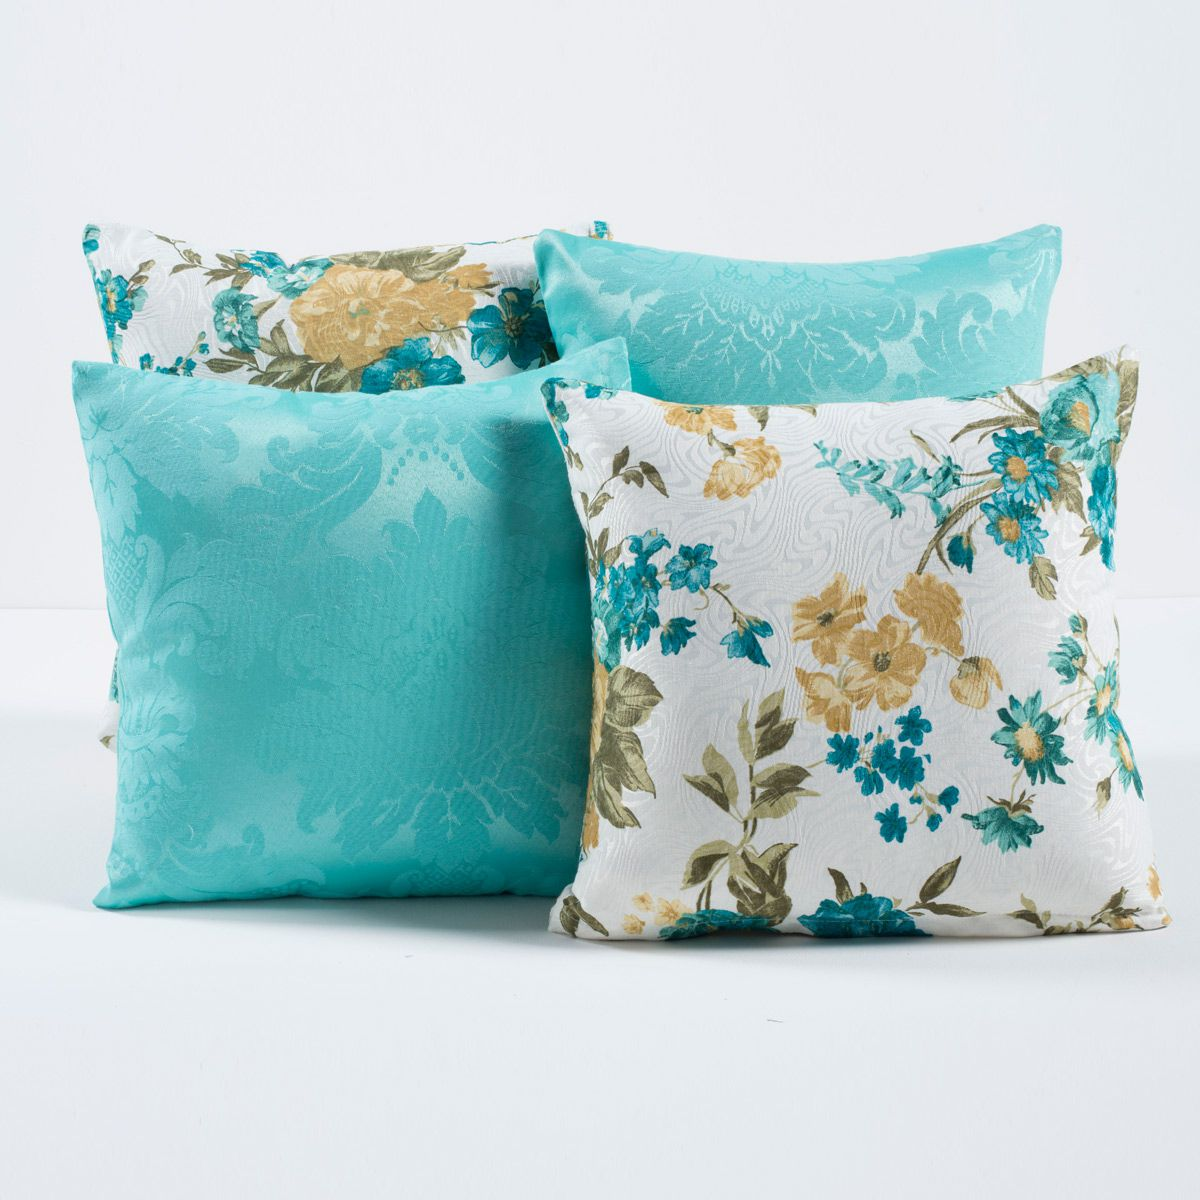 Kit Capas de Almofadas Decorativas Tiffany Floral 04 Peças